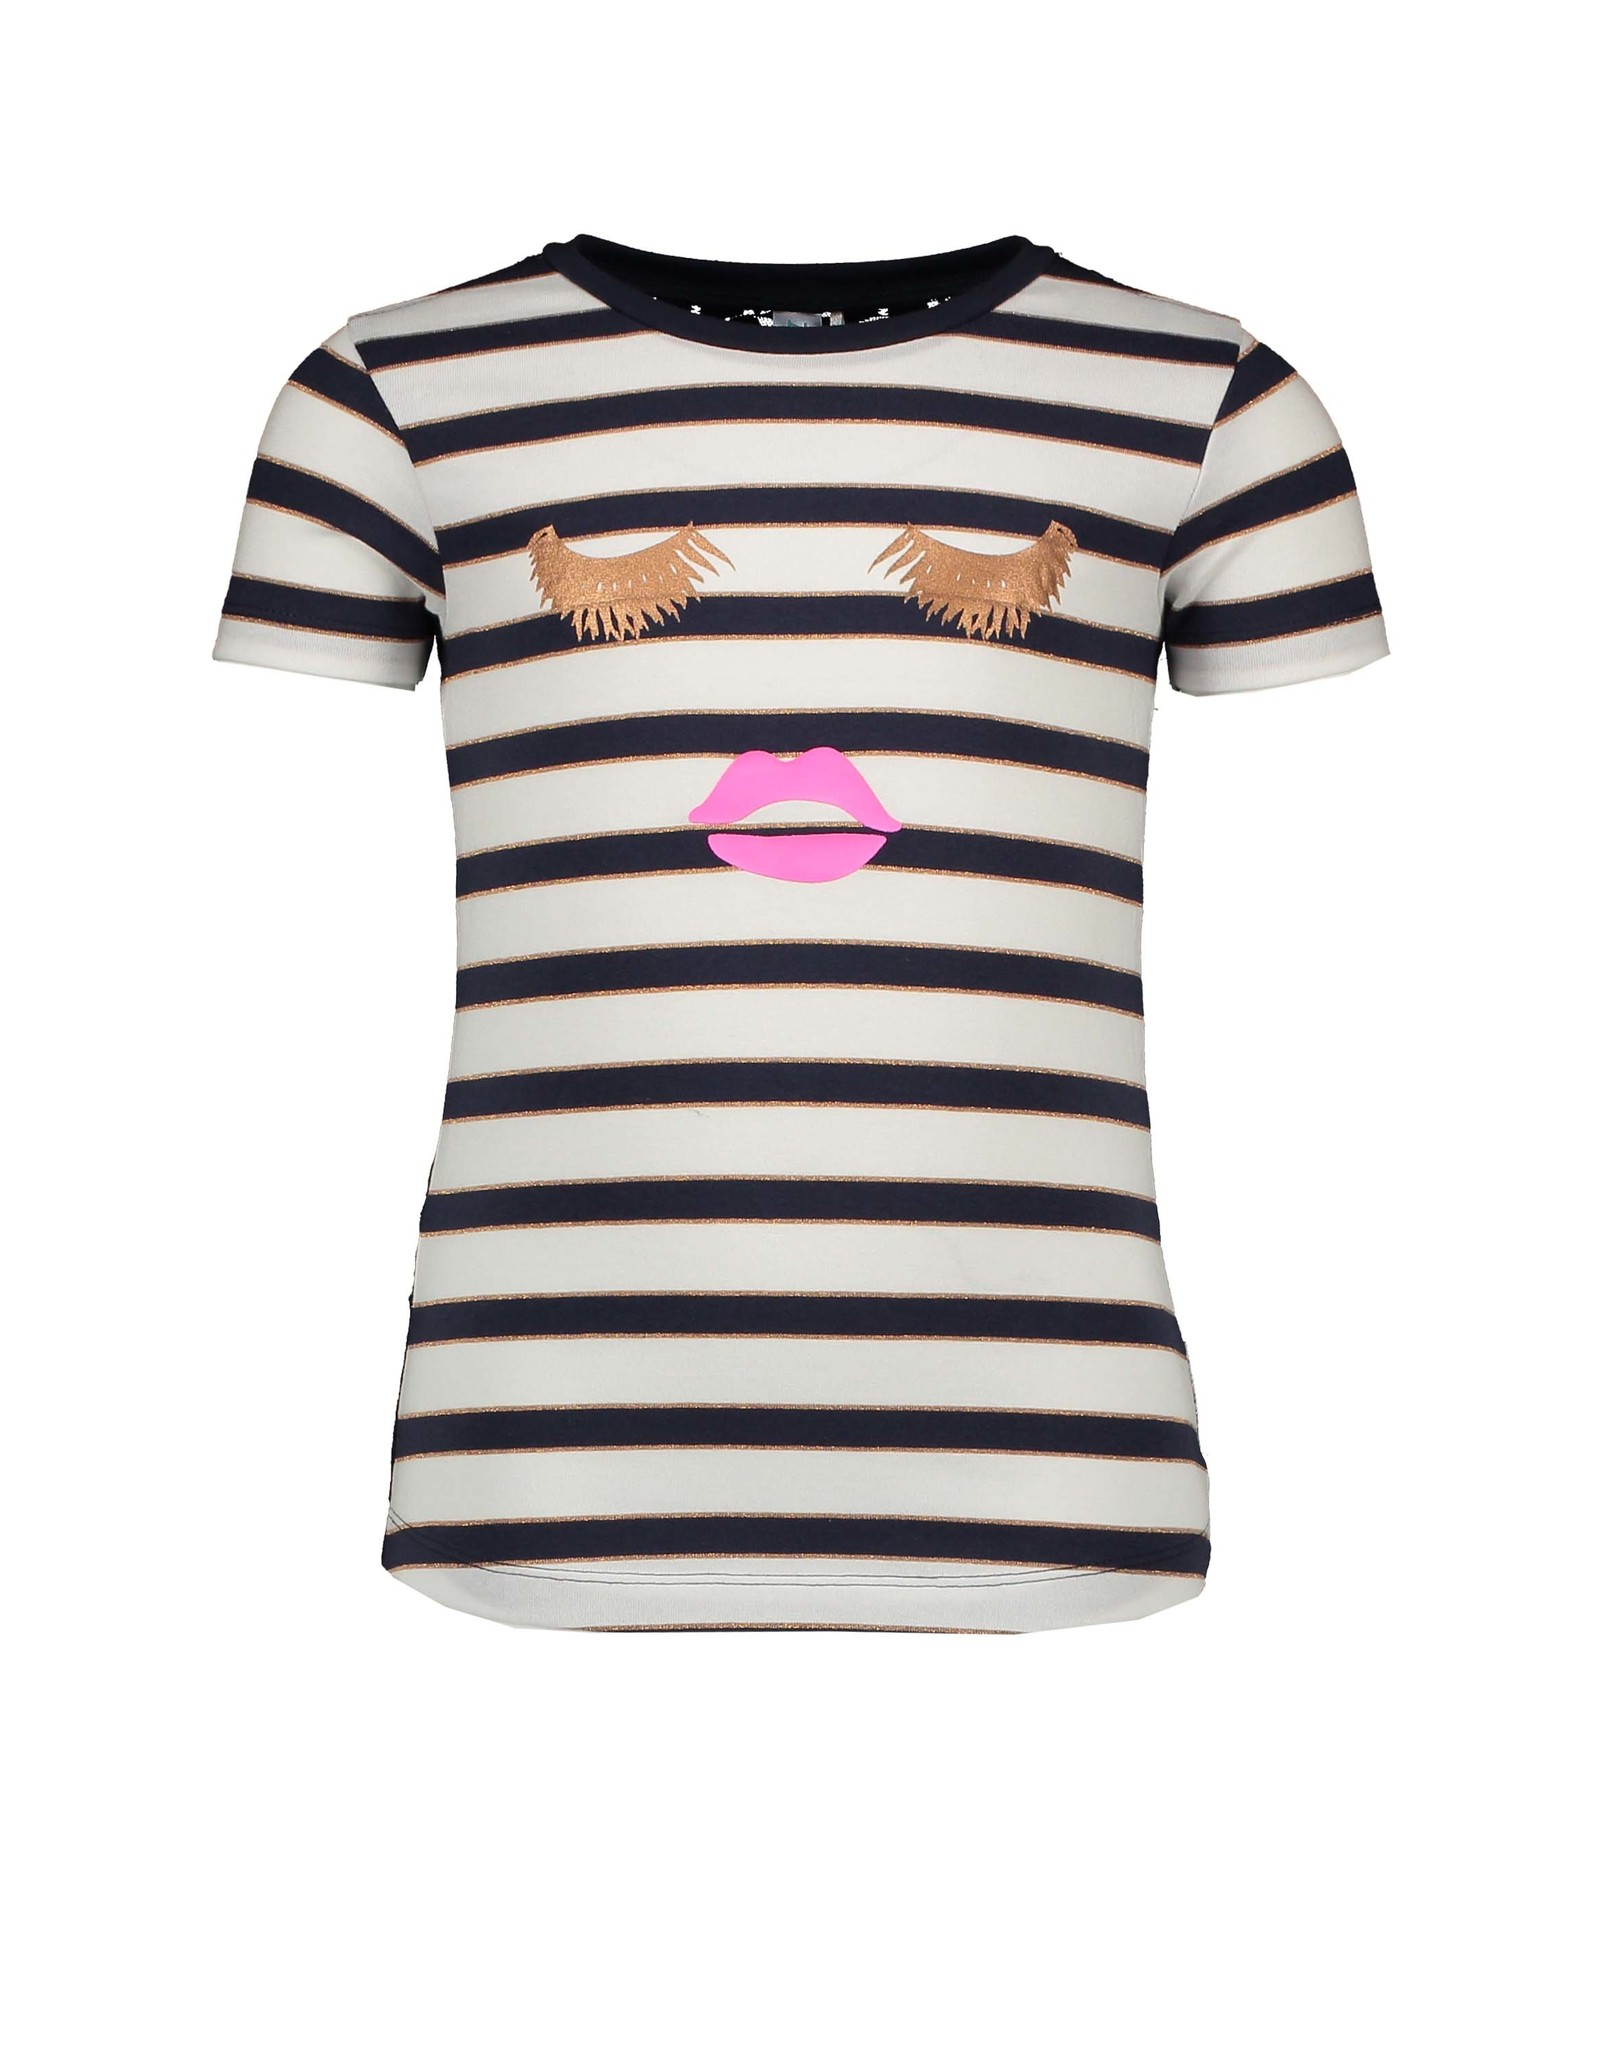 B.Nosy B.Nosy Girls YDS Shirt with lace backside OXFORD STRIPE